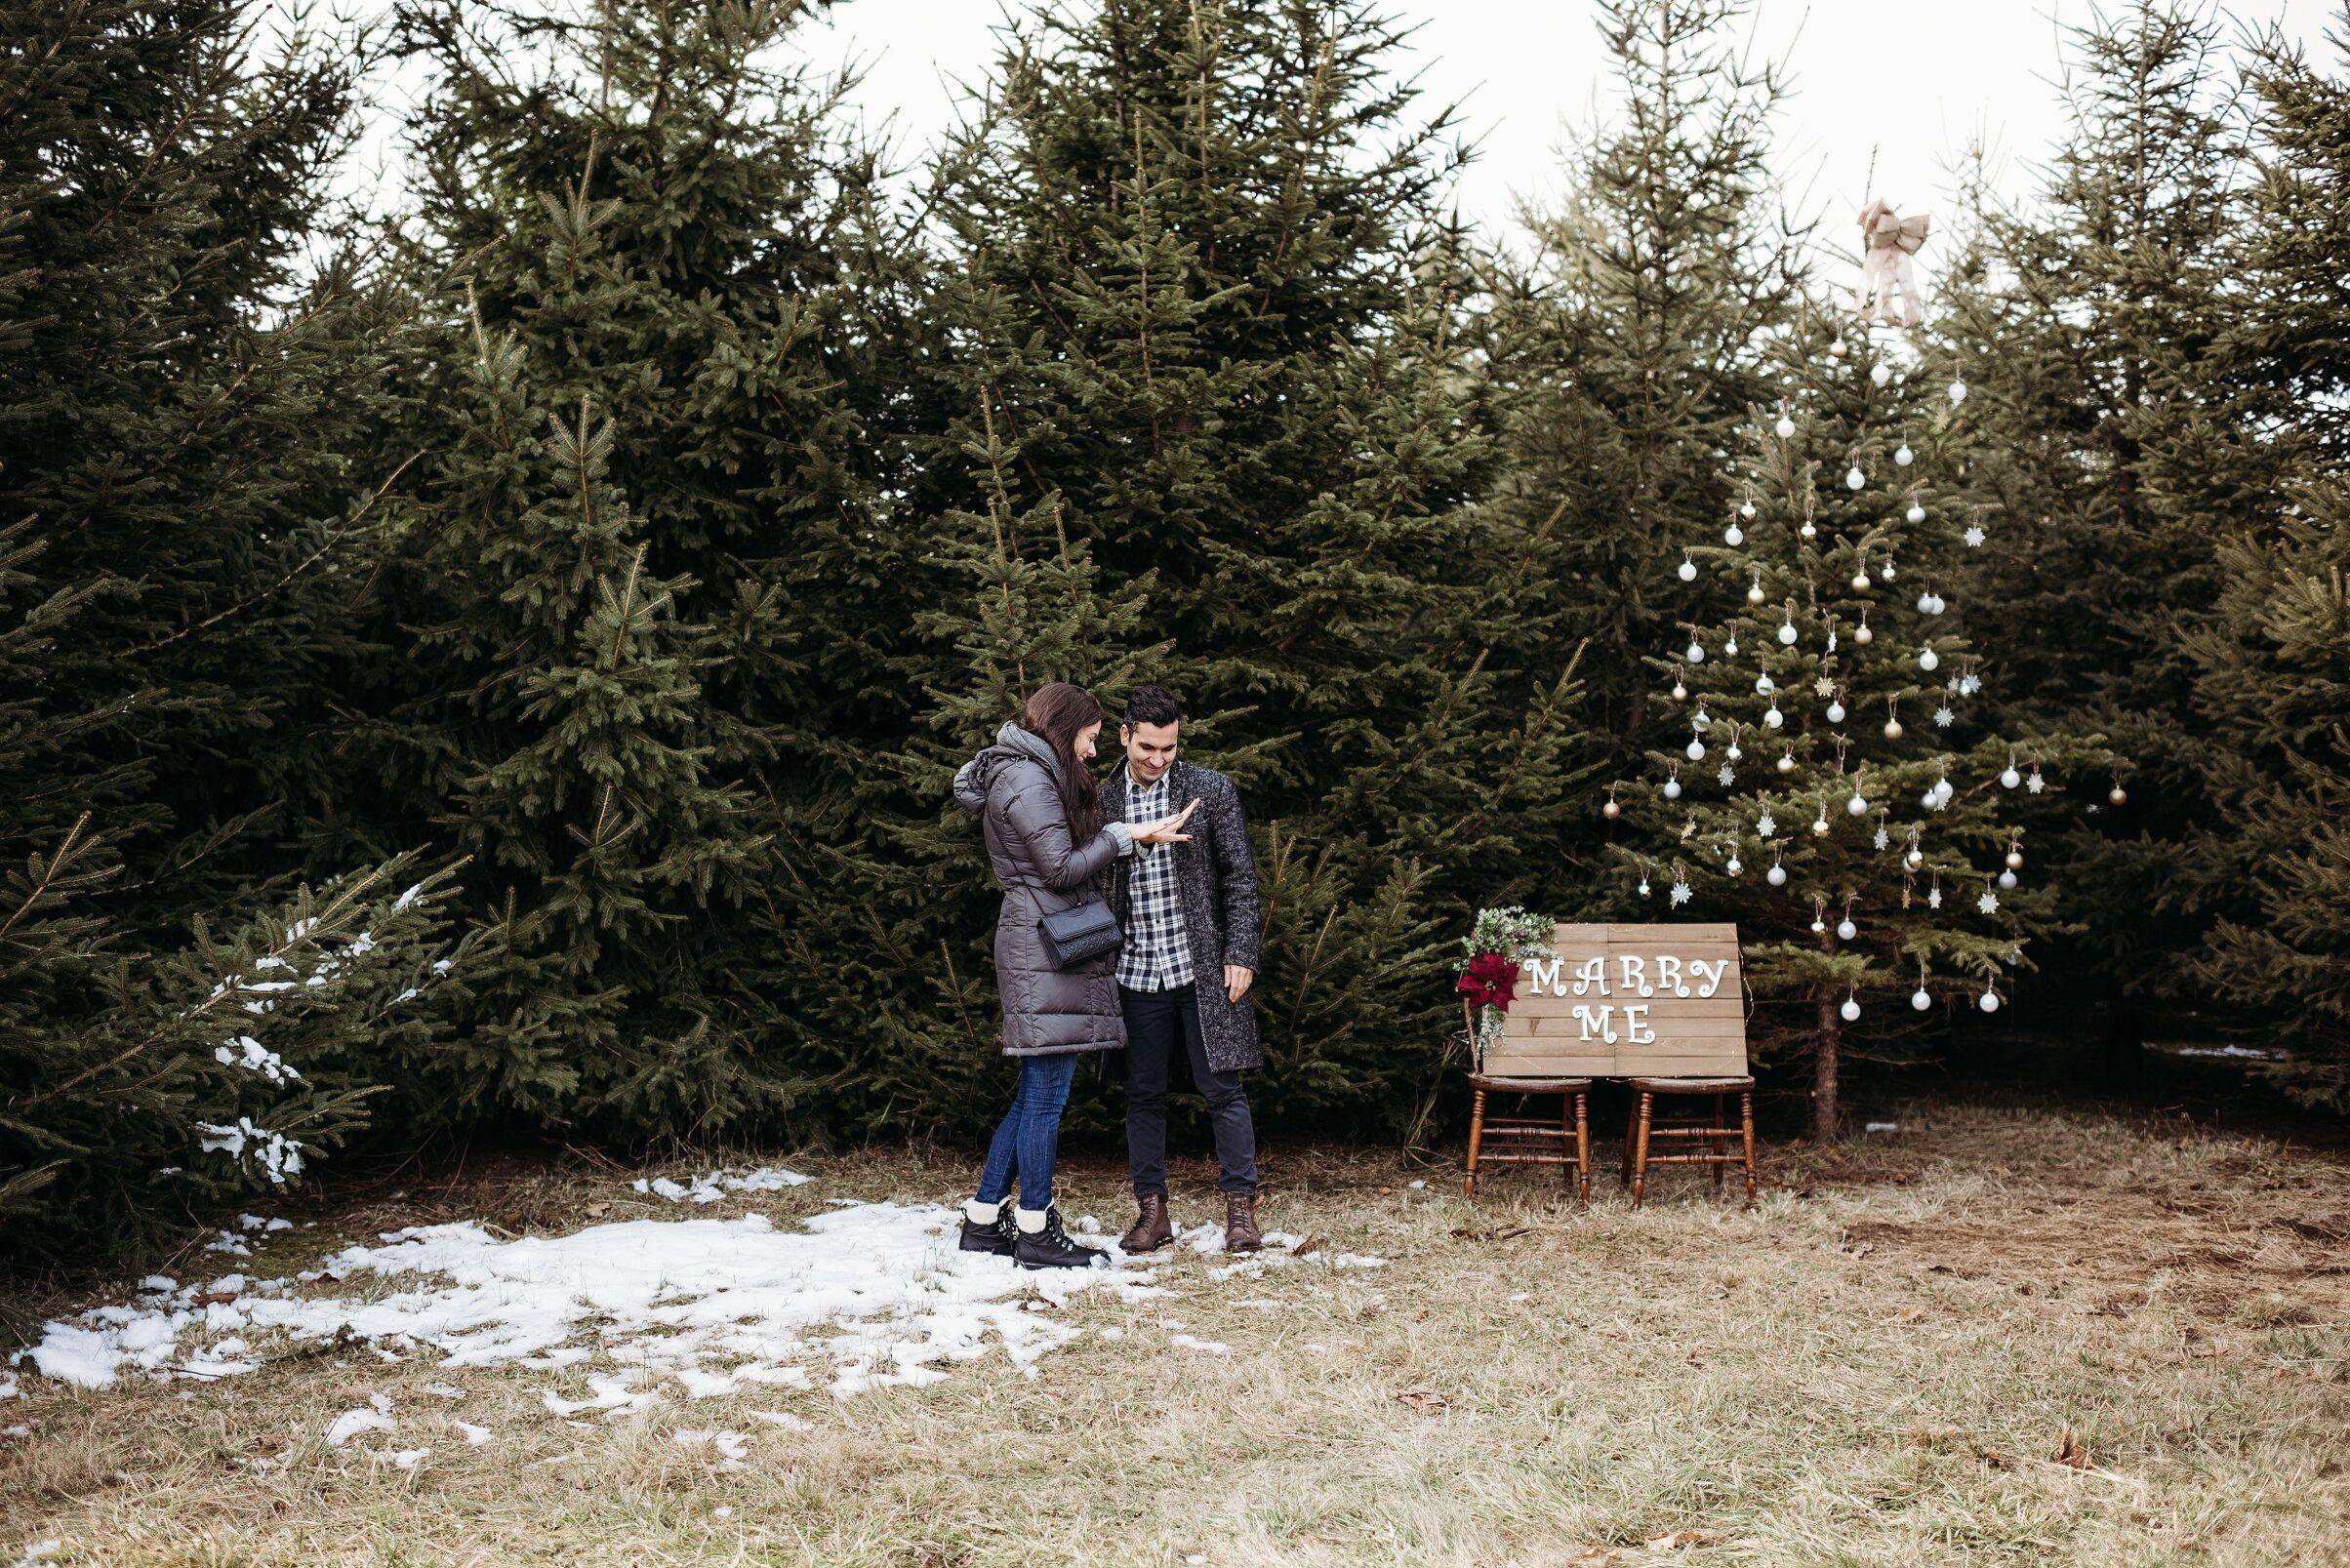 Melissaantproposal2019 27 Jpg In 2020 Mountain Photography Small Intimate Wedding Nj Wedding Photographer